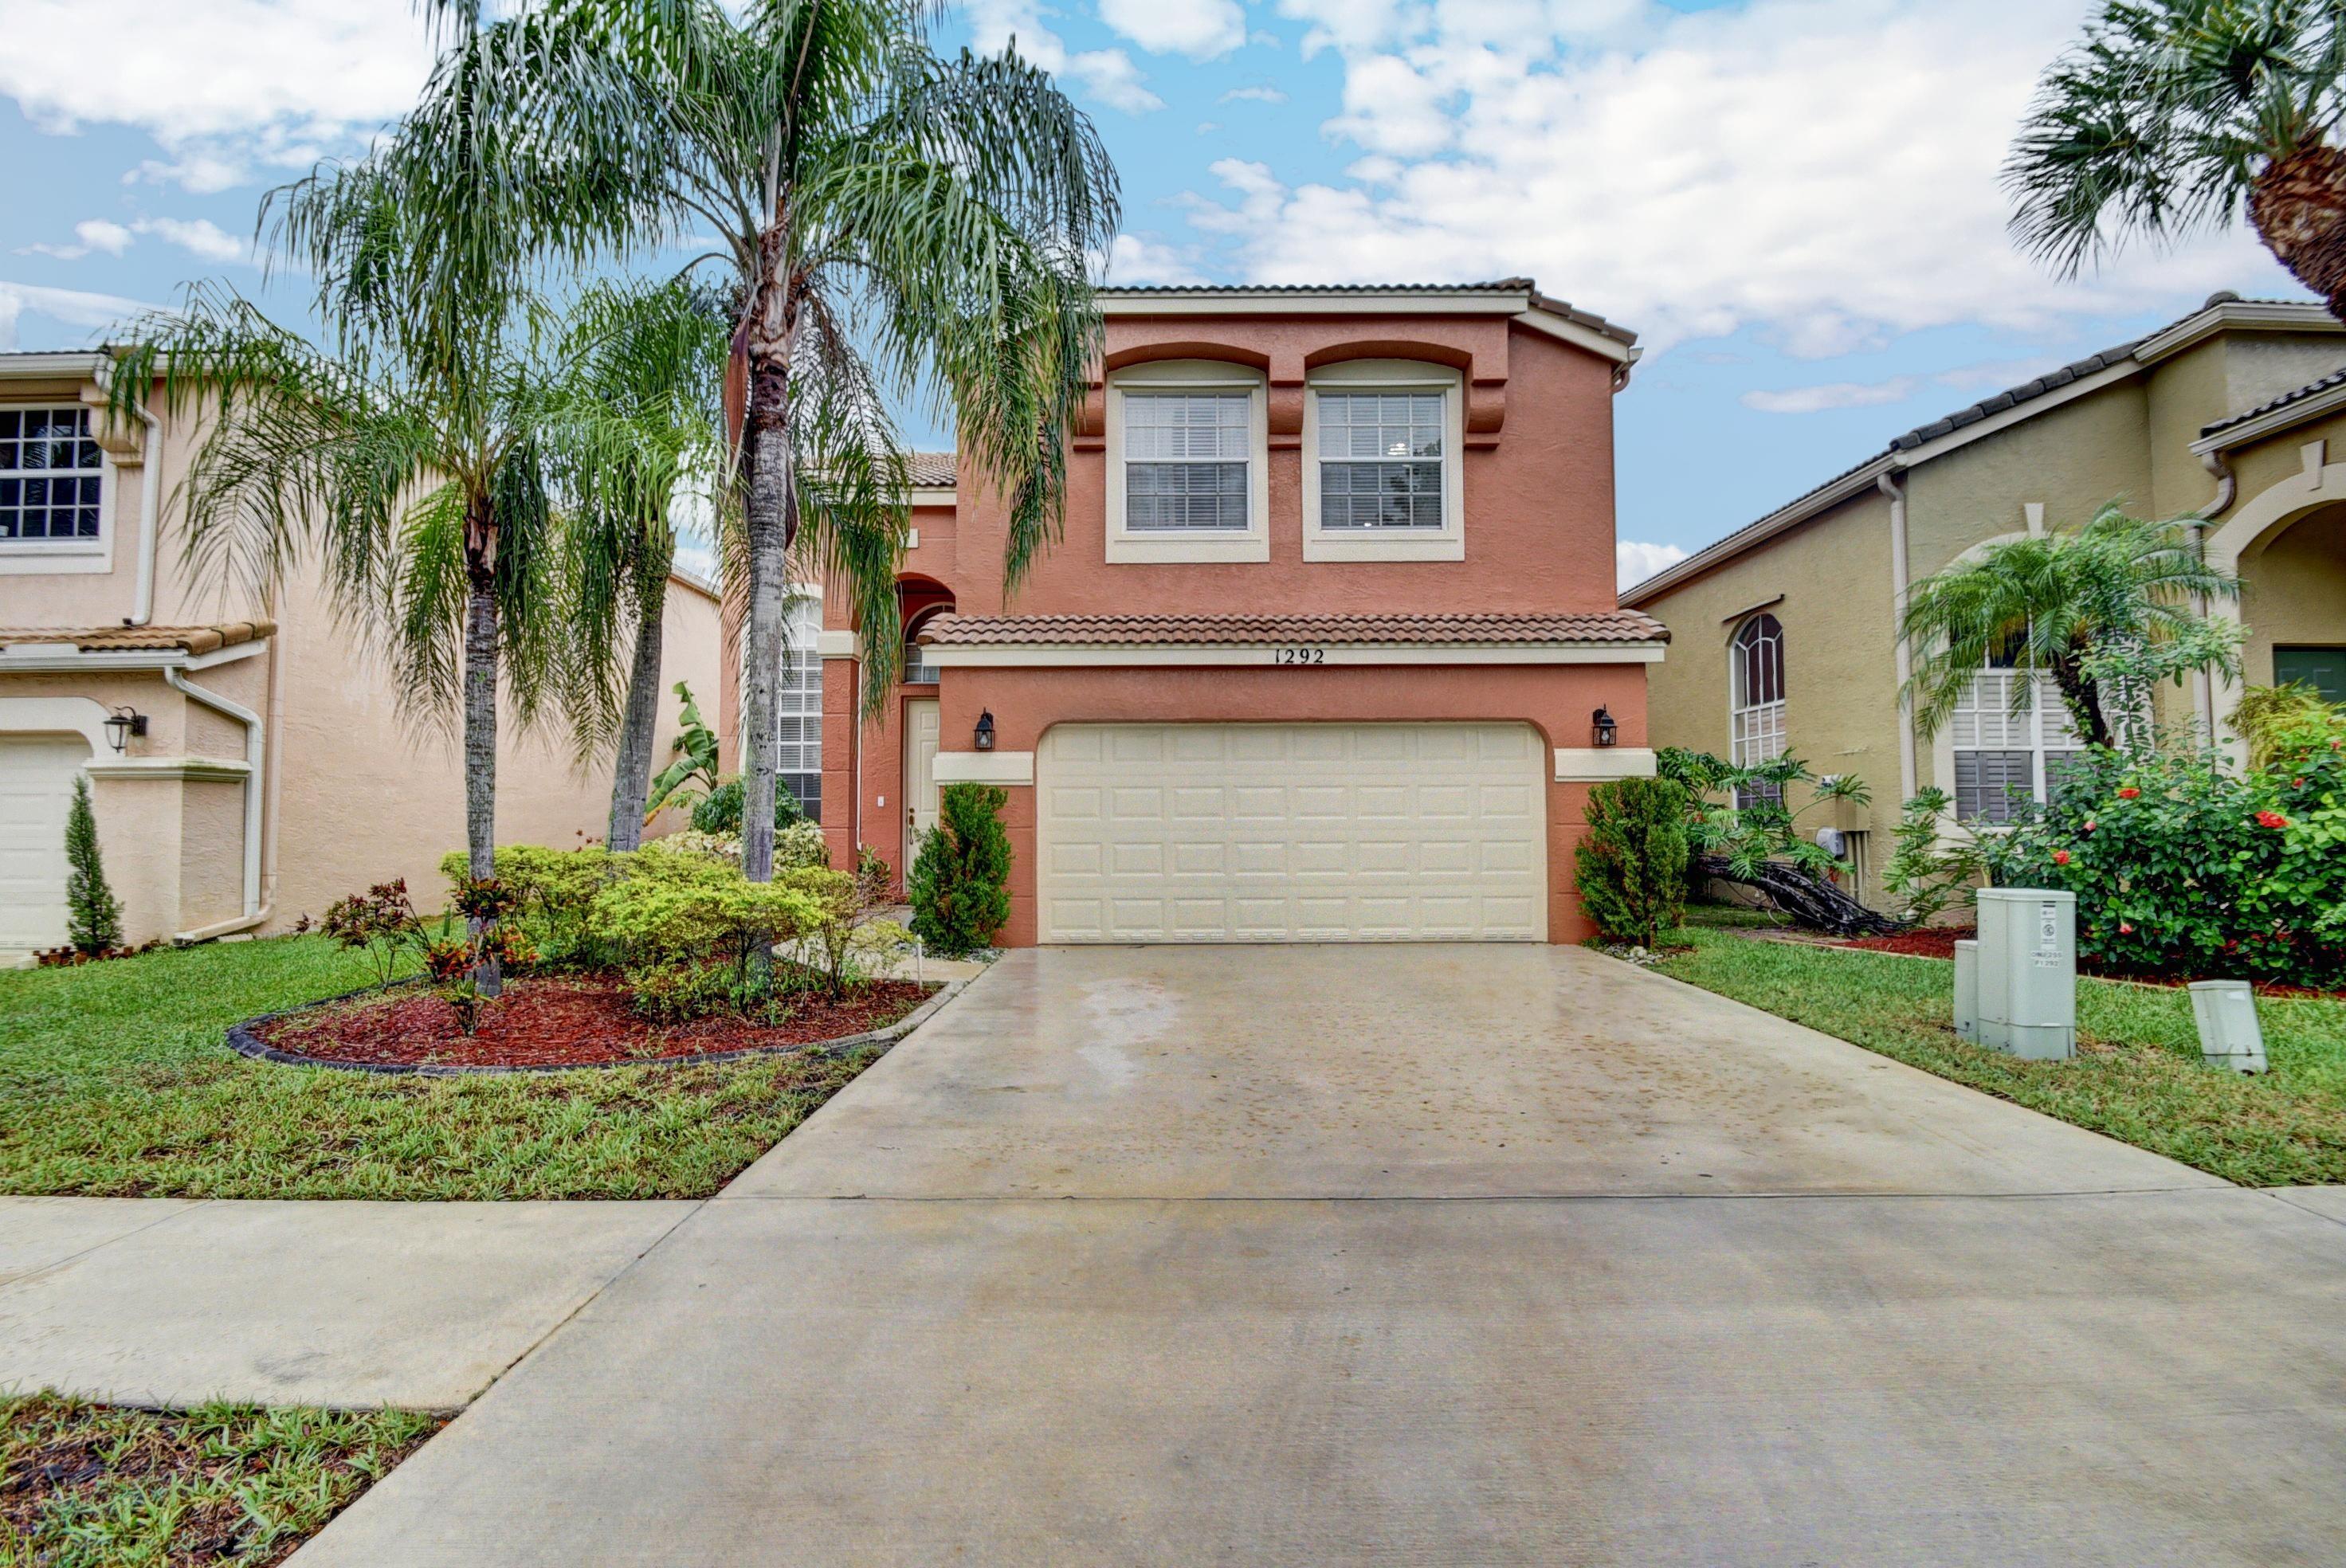 Home for sale in Wyndham Village Royal Palm Beach Florida